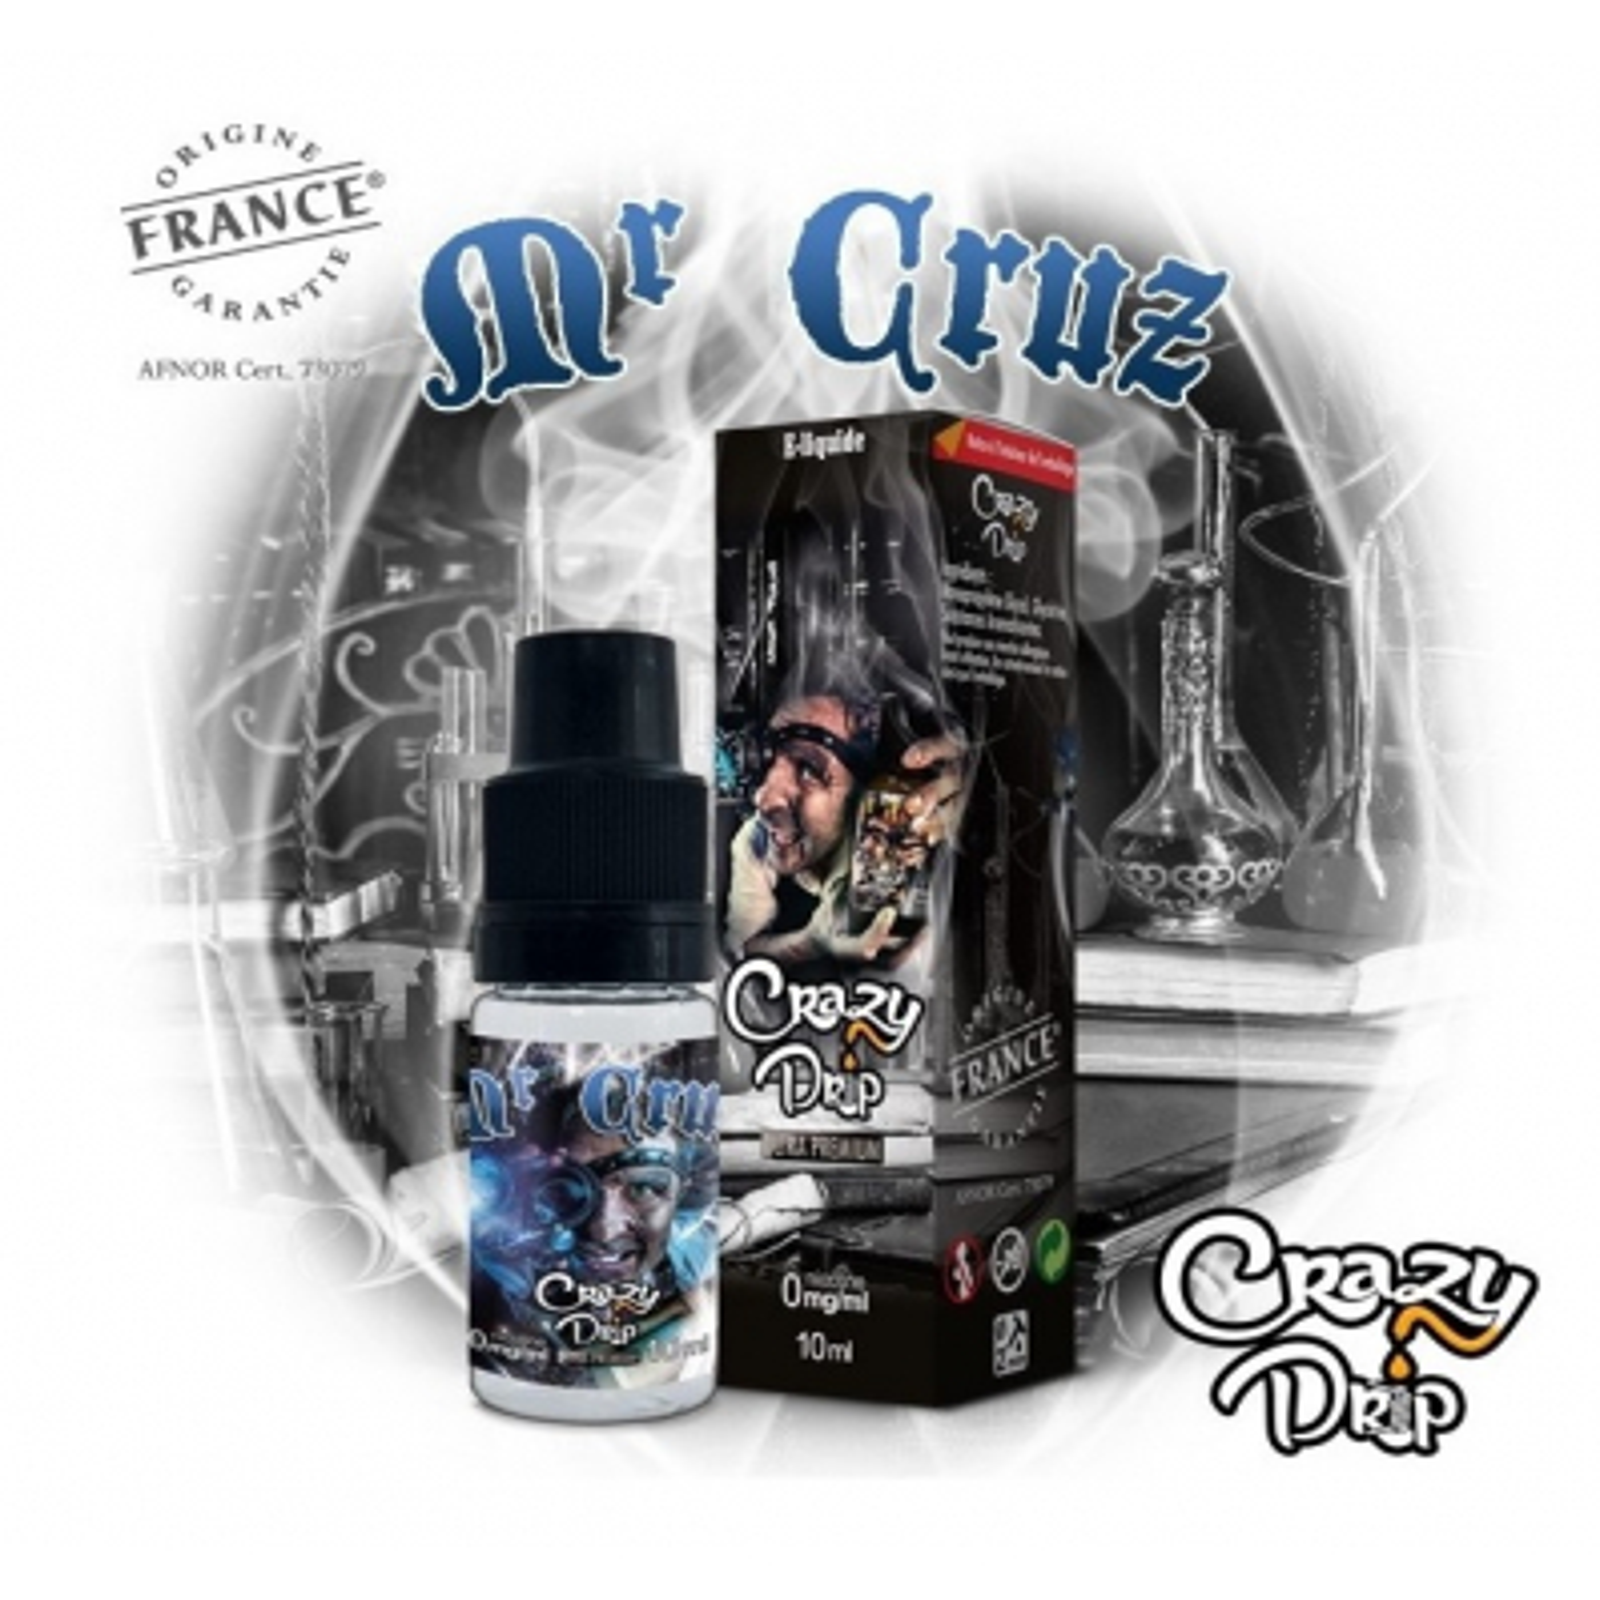 Mr Cruz - Crazy Drip